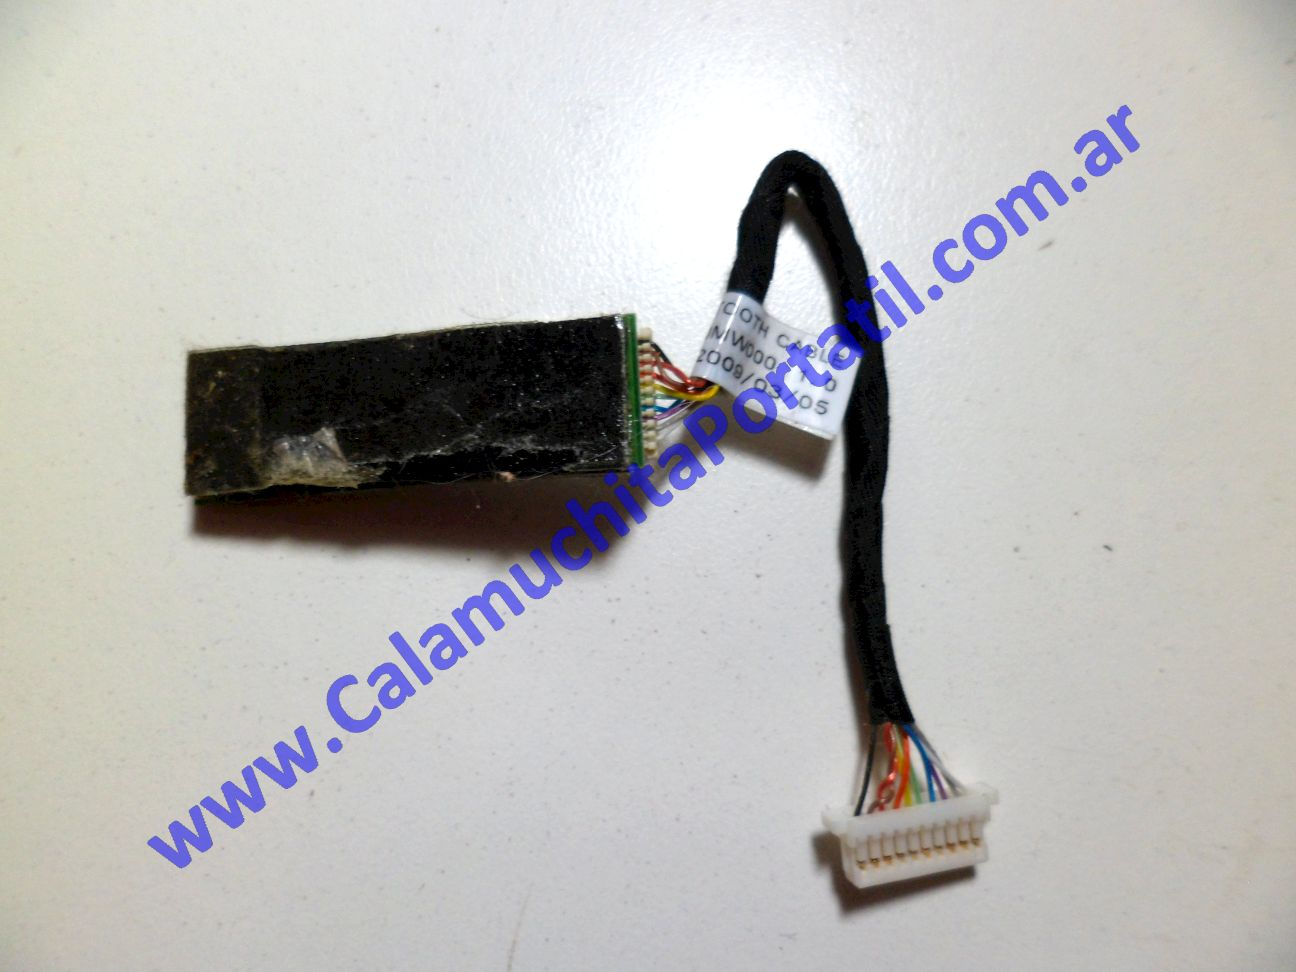 0085PBL Placa Bluetooth Asus Eee PC 1000HE Azul